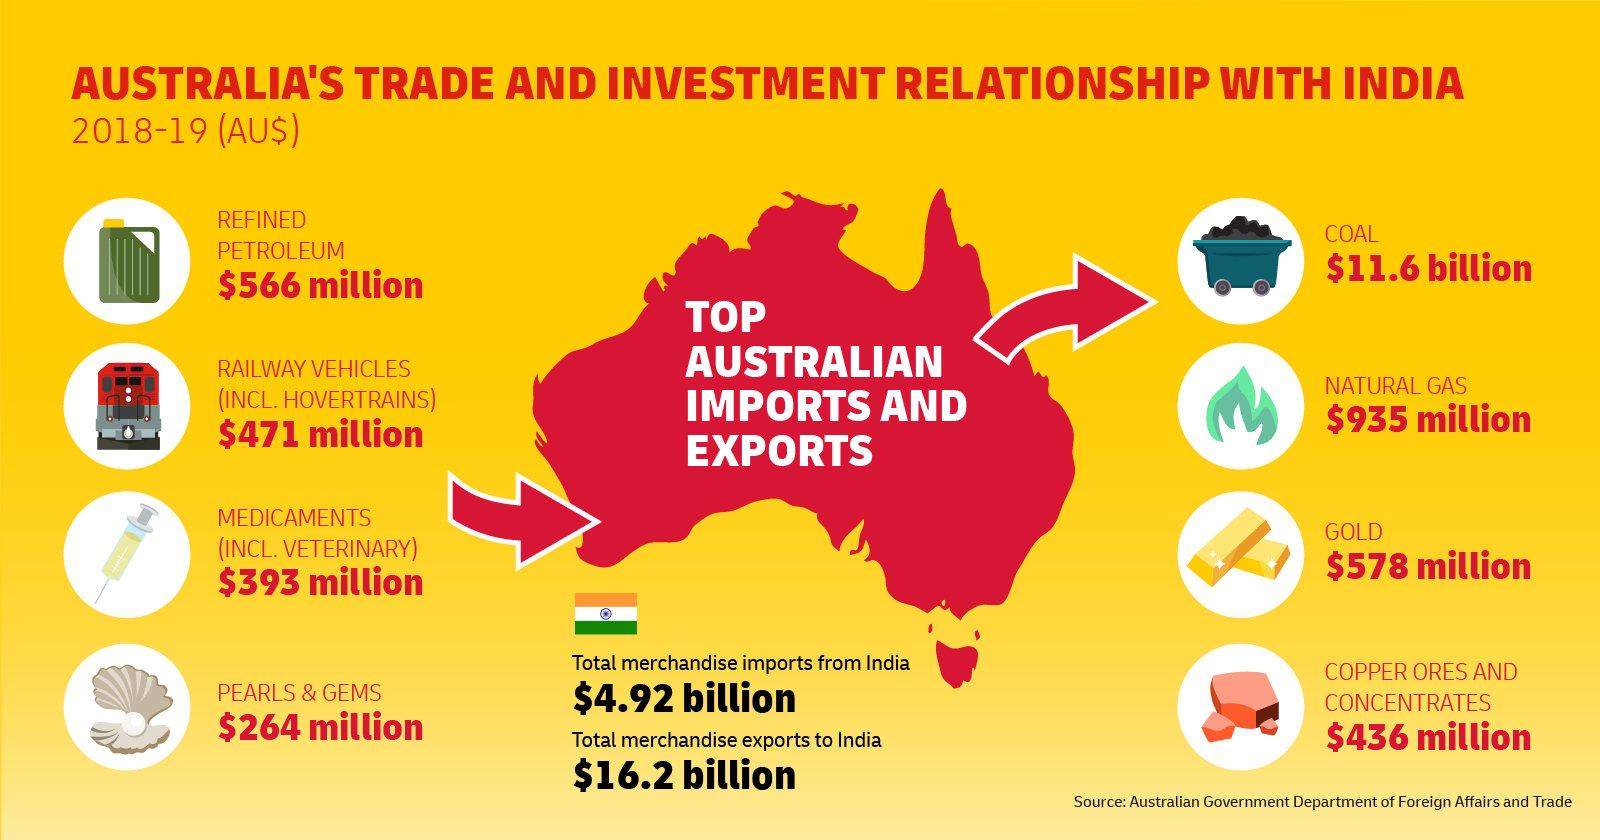 Australia-India trade